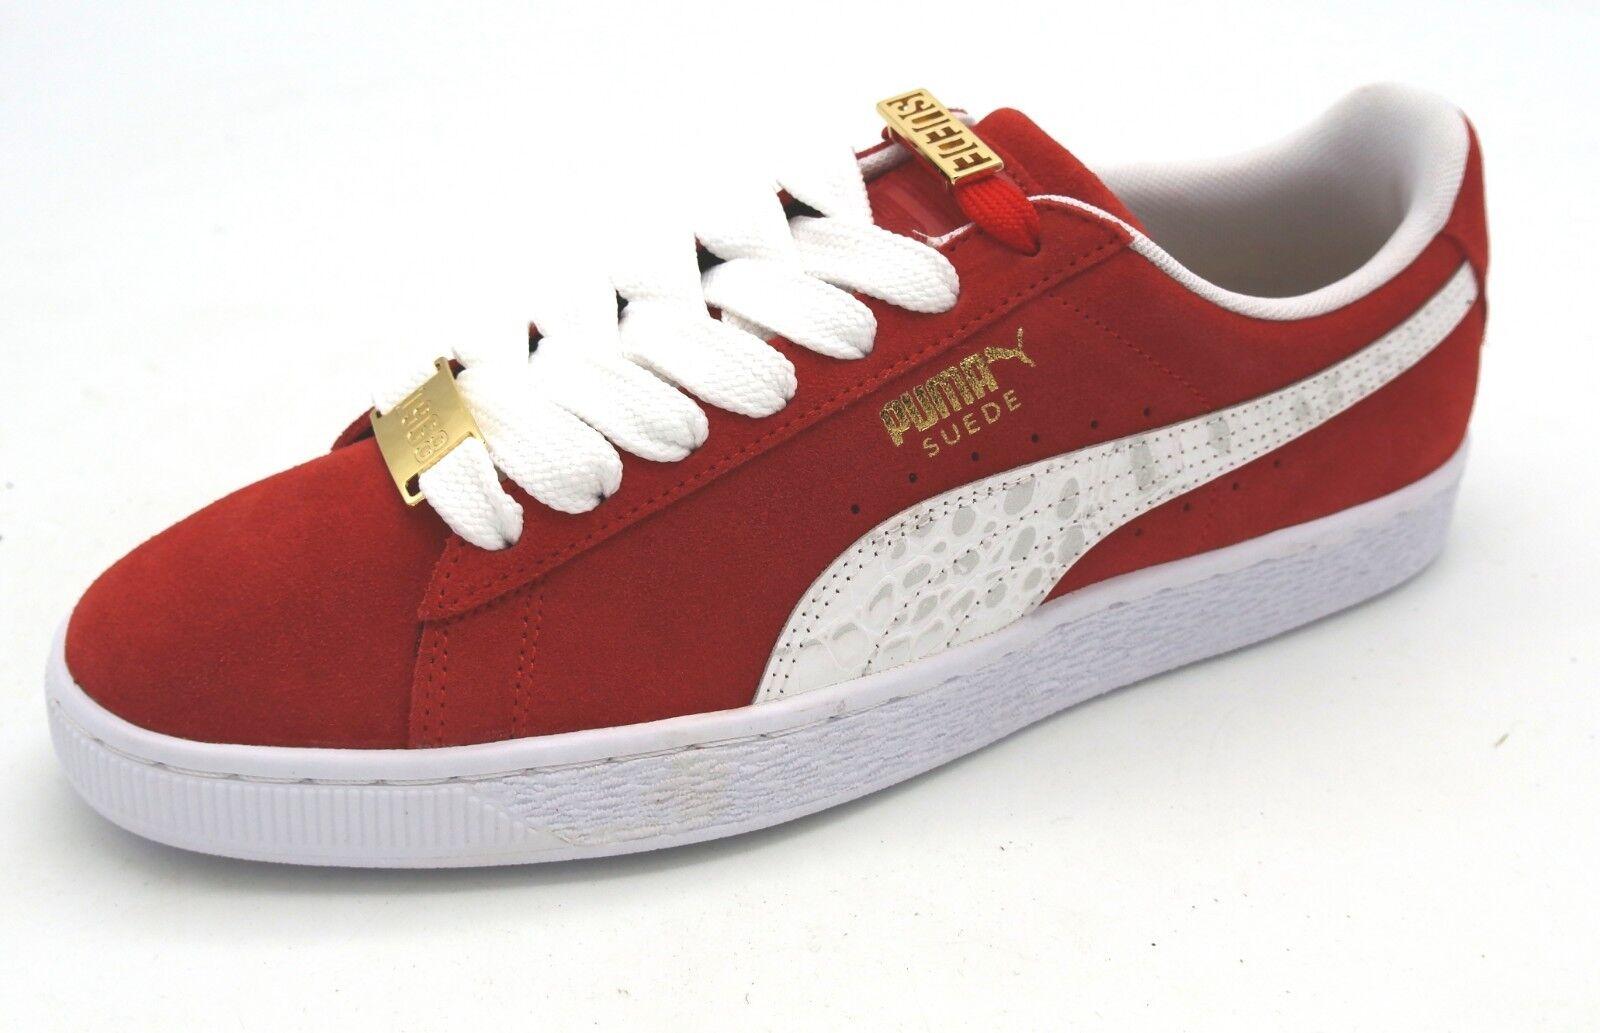 J7691 New Men's Puma Suede Classic BBoy Fabulous Red White Sneaker 10.5 M